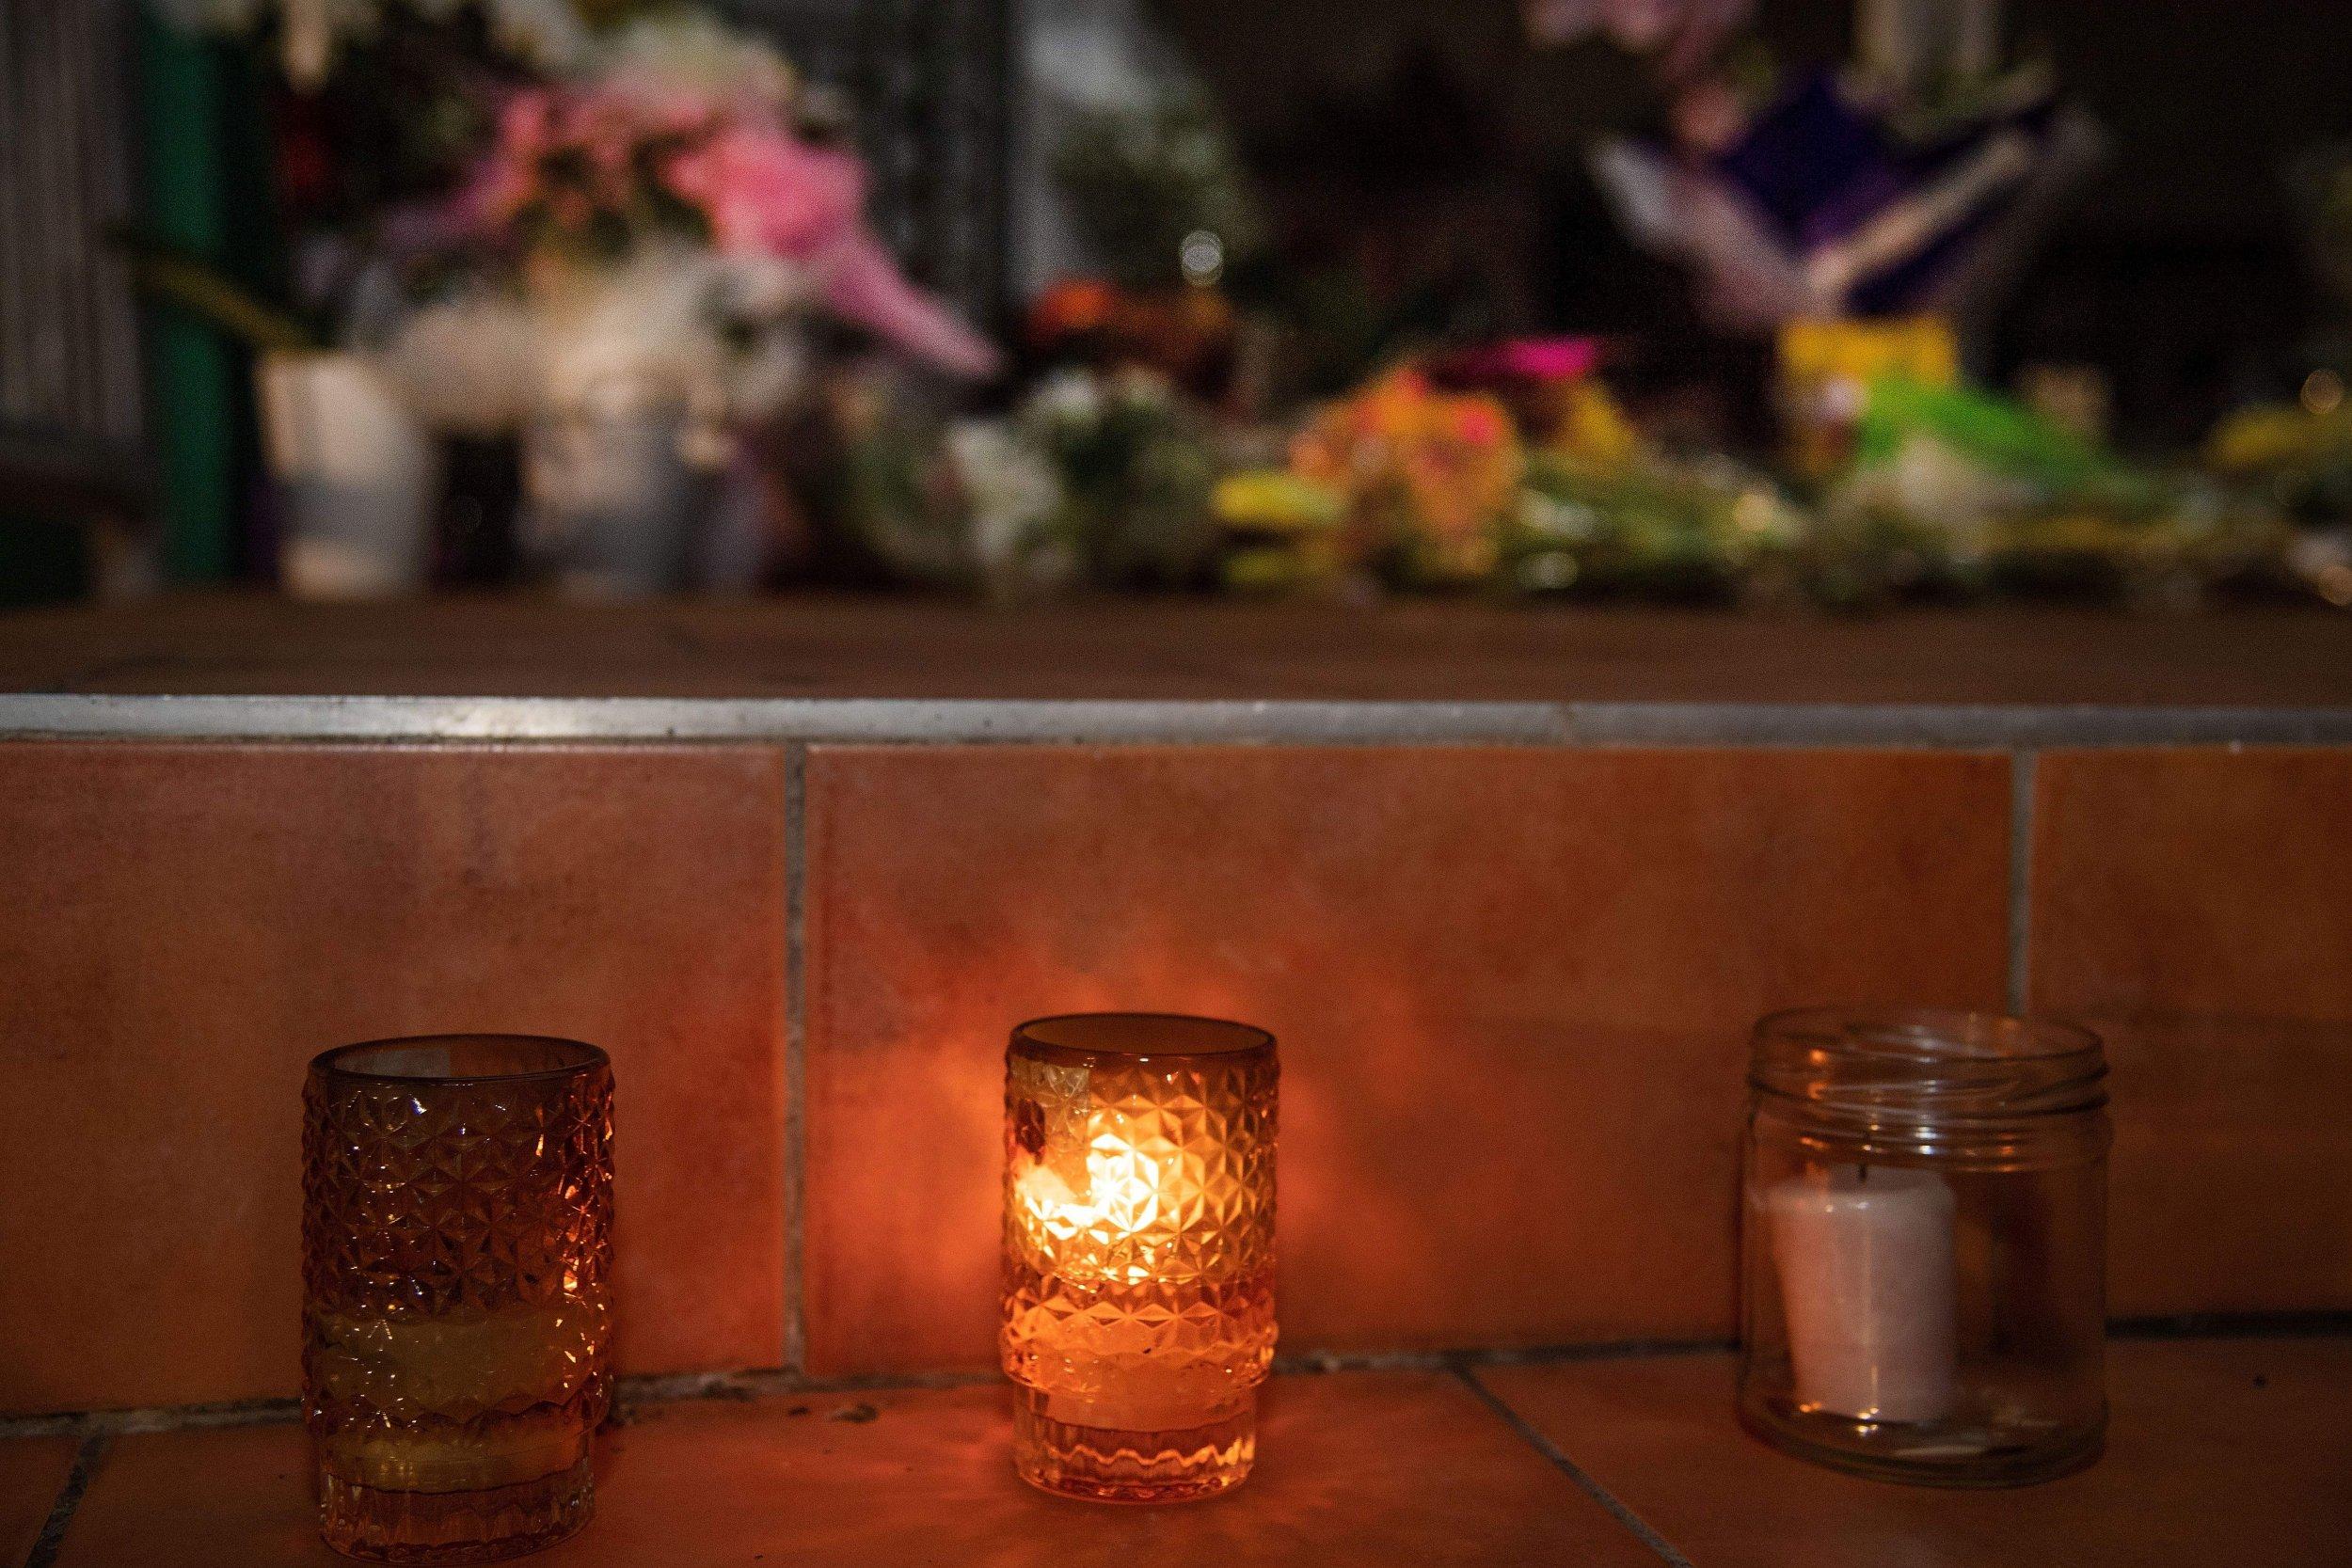 christchurch mosque shooting gunman man charged